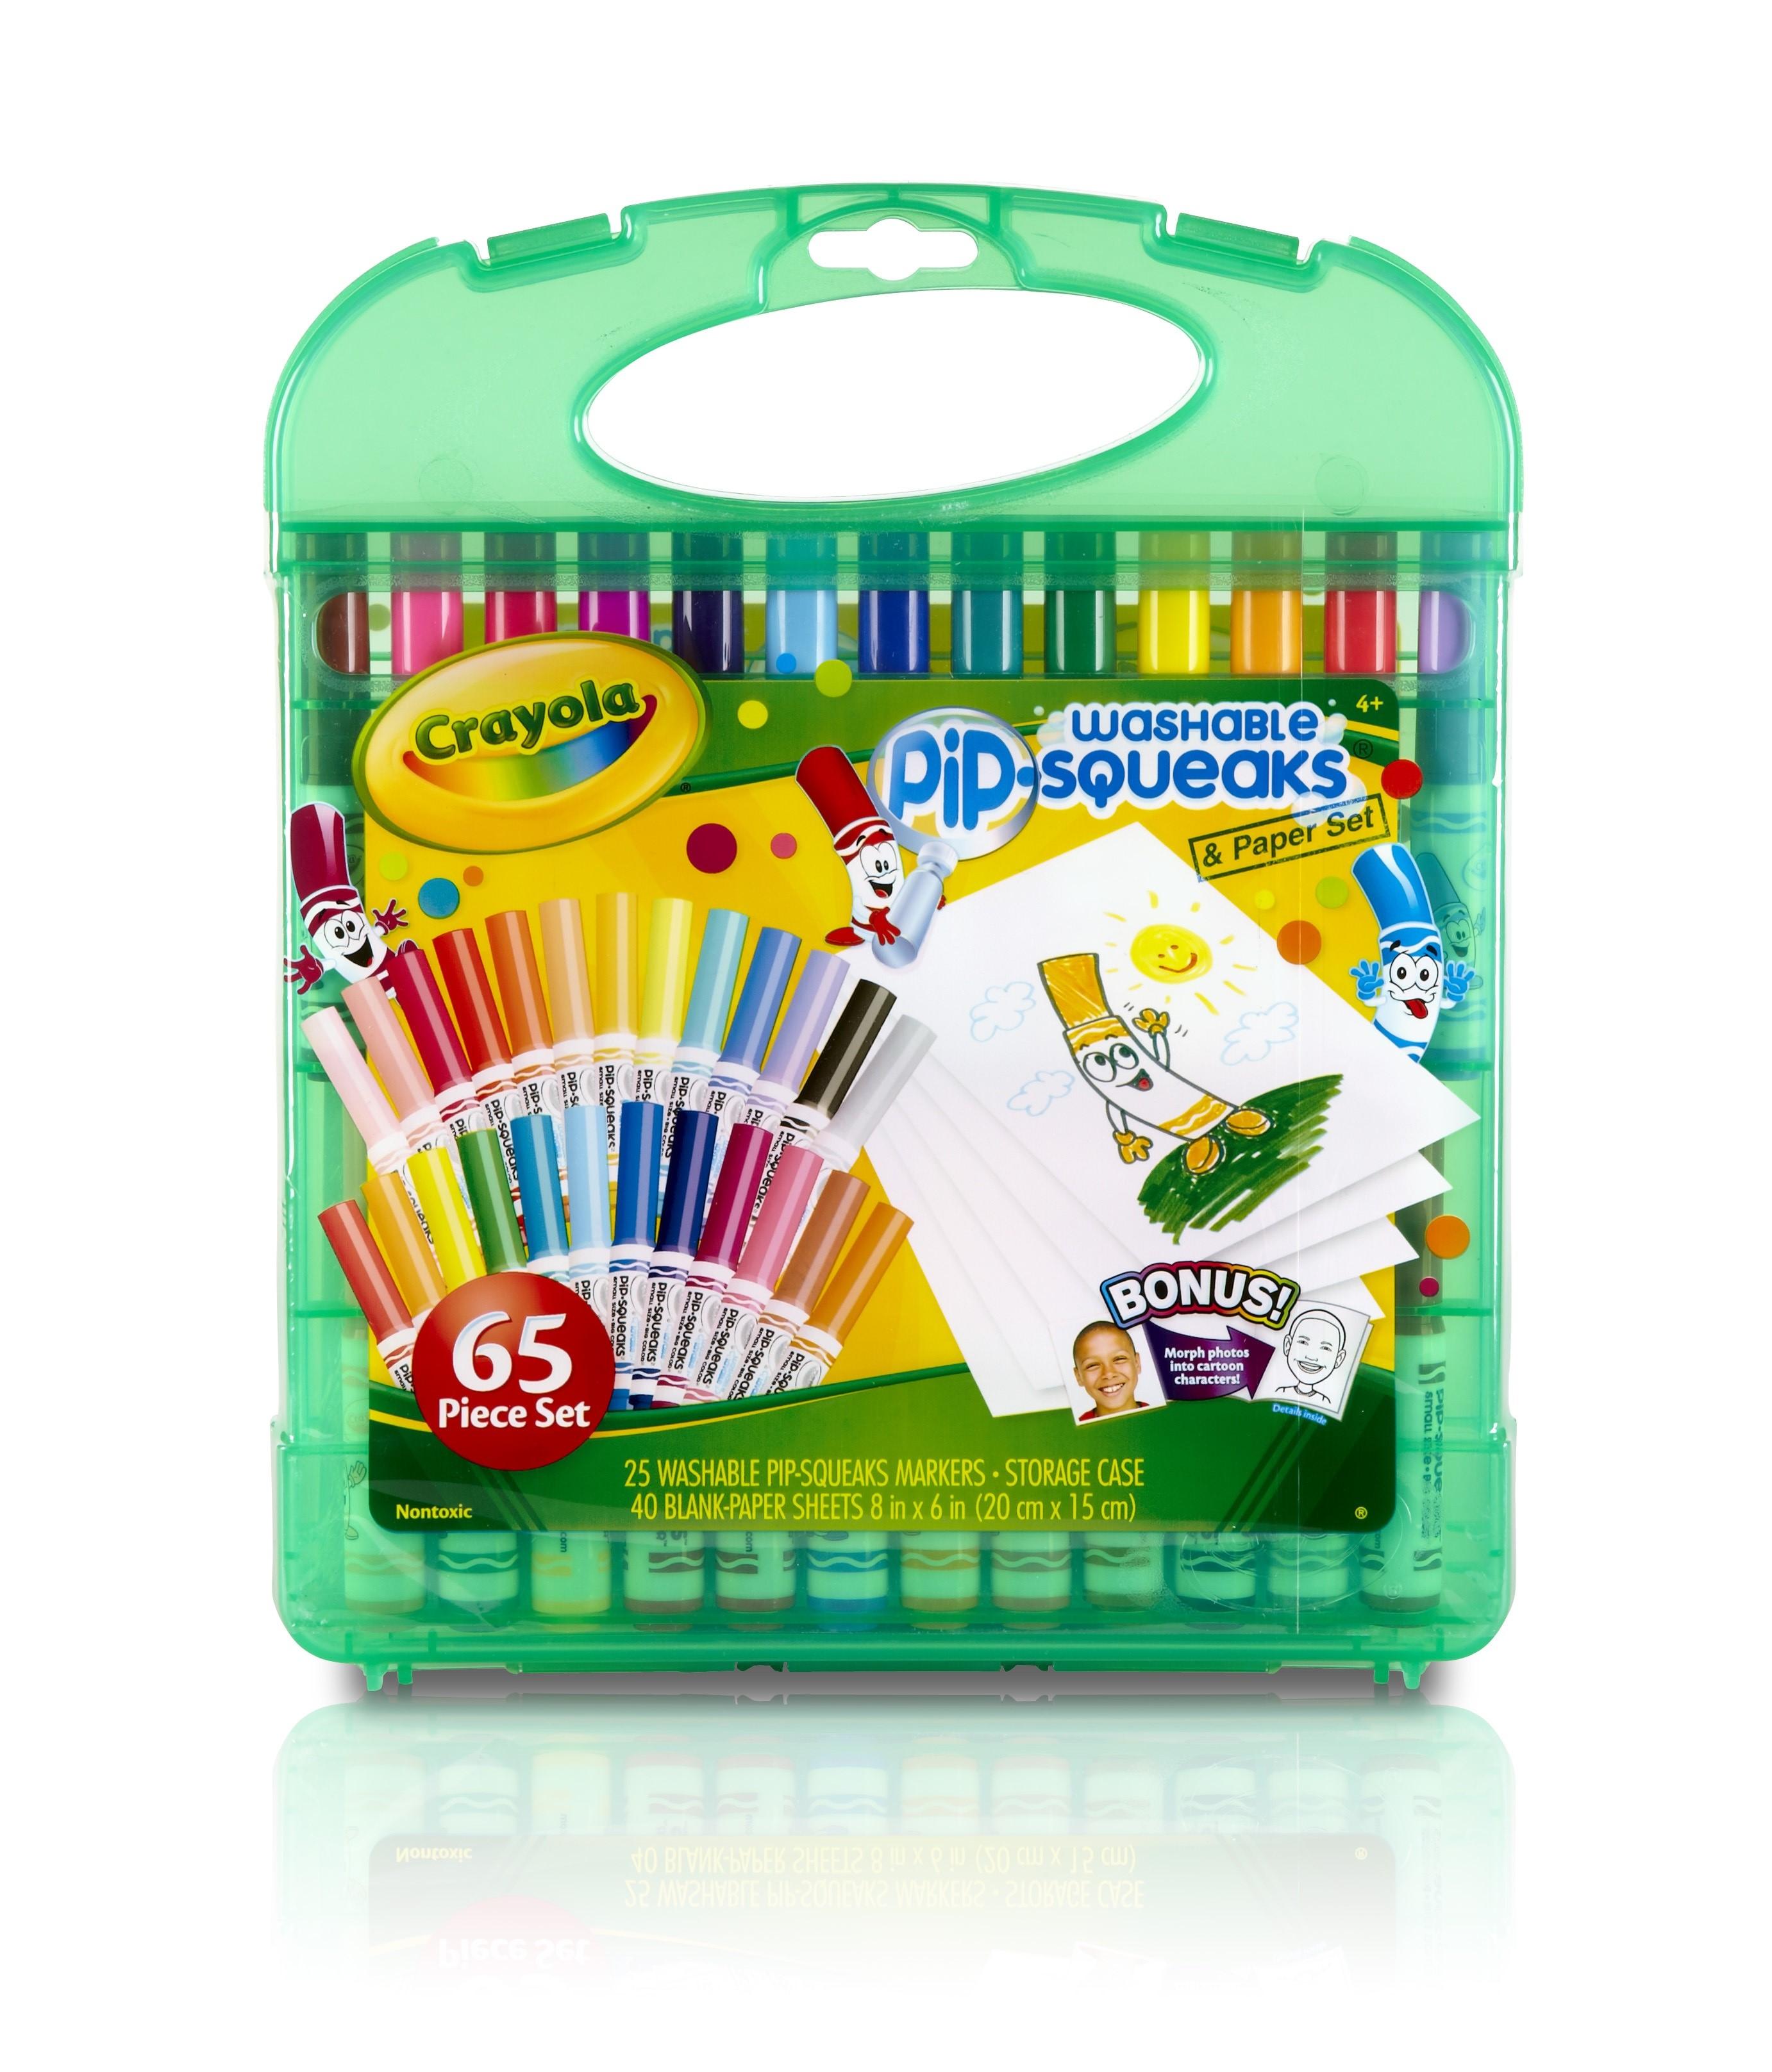 Crayola 04-5227 Pip-Squeaks Marker & Paper Set by Crayola